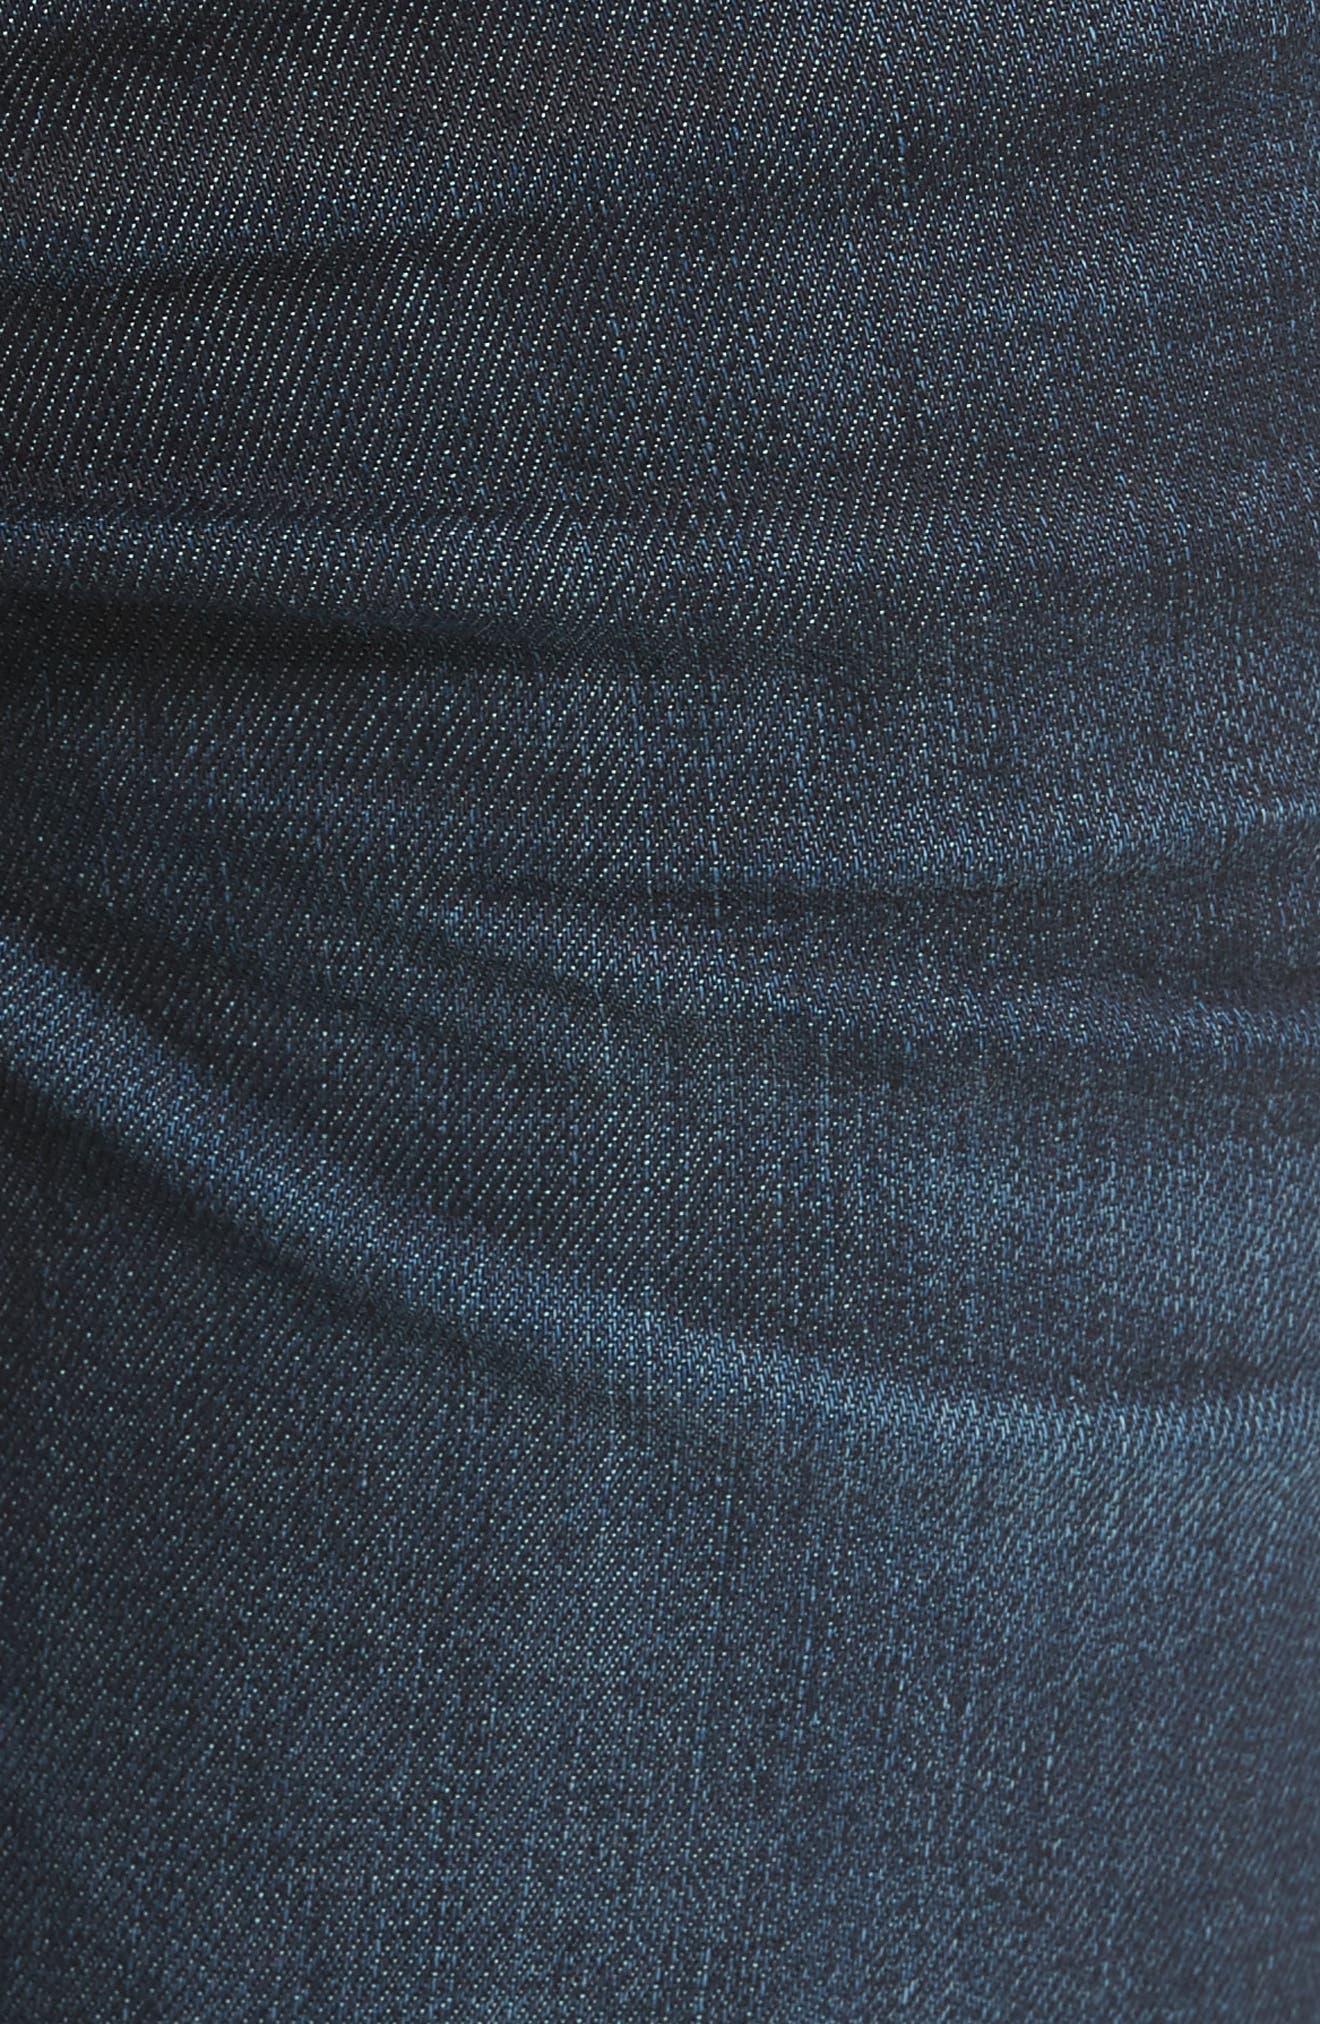 Brixton Slim Straight Leg Jeans,                             Alternate thumbnail 5, color,                             430